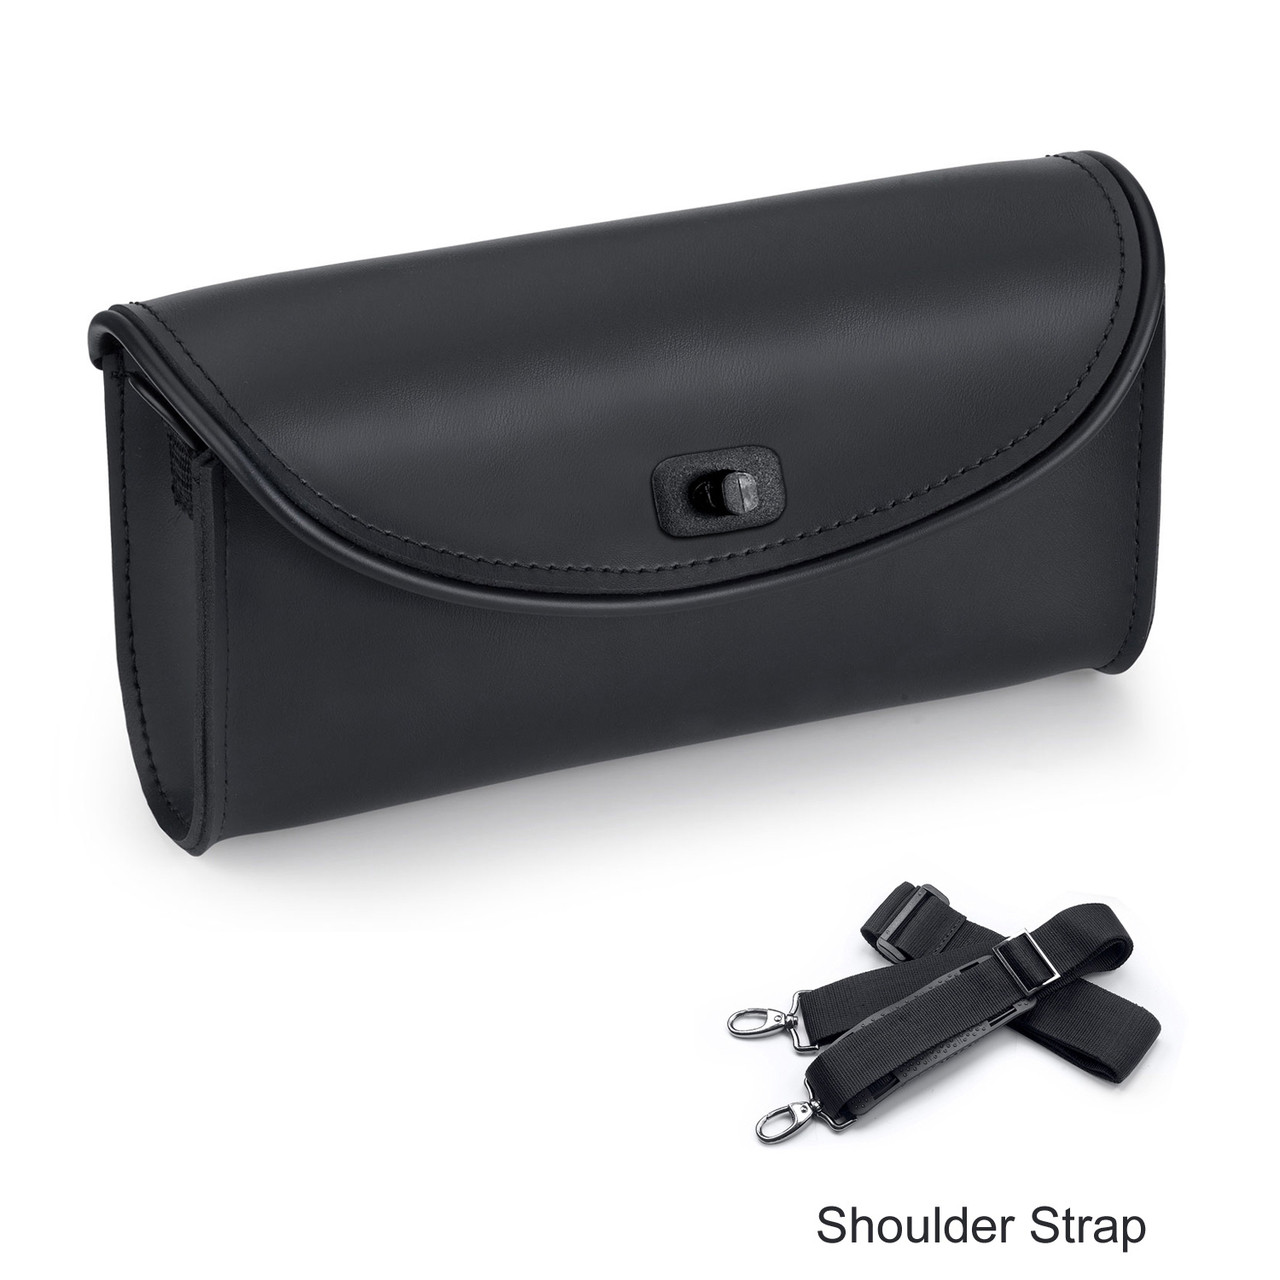 Large Detachable Motorcycle Windshield Bag With Shoulder Strap